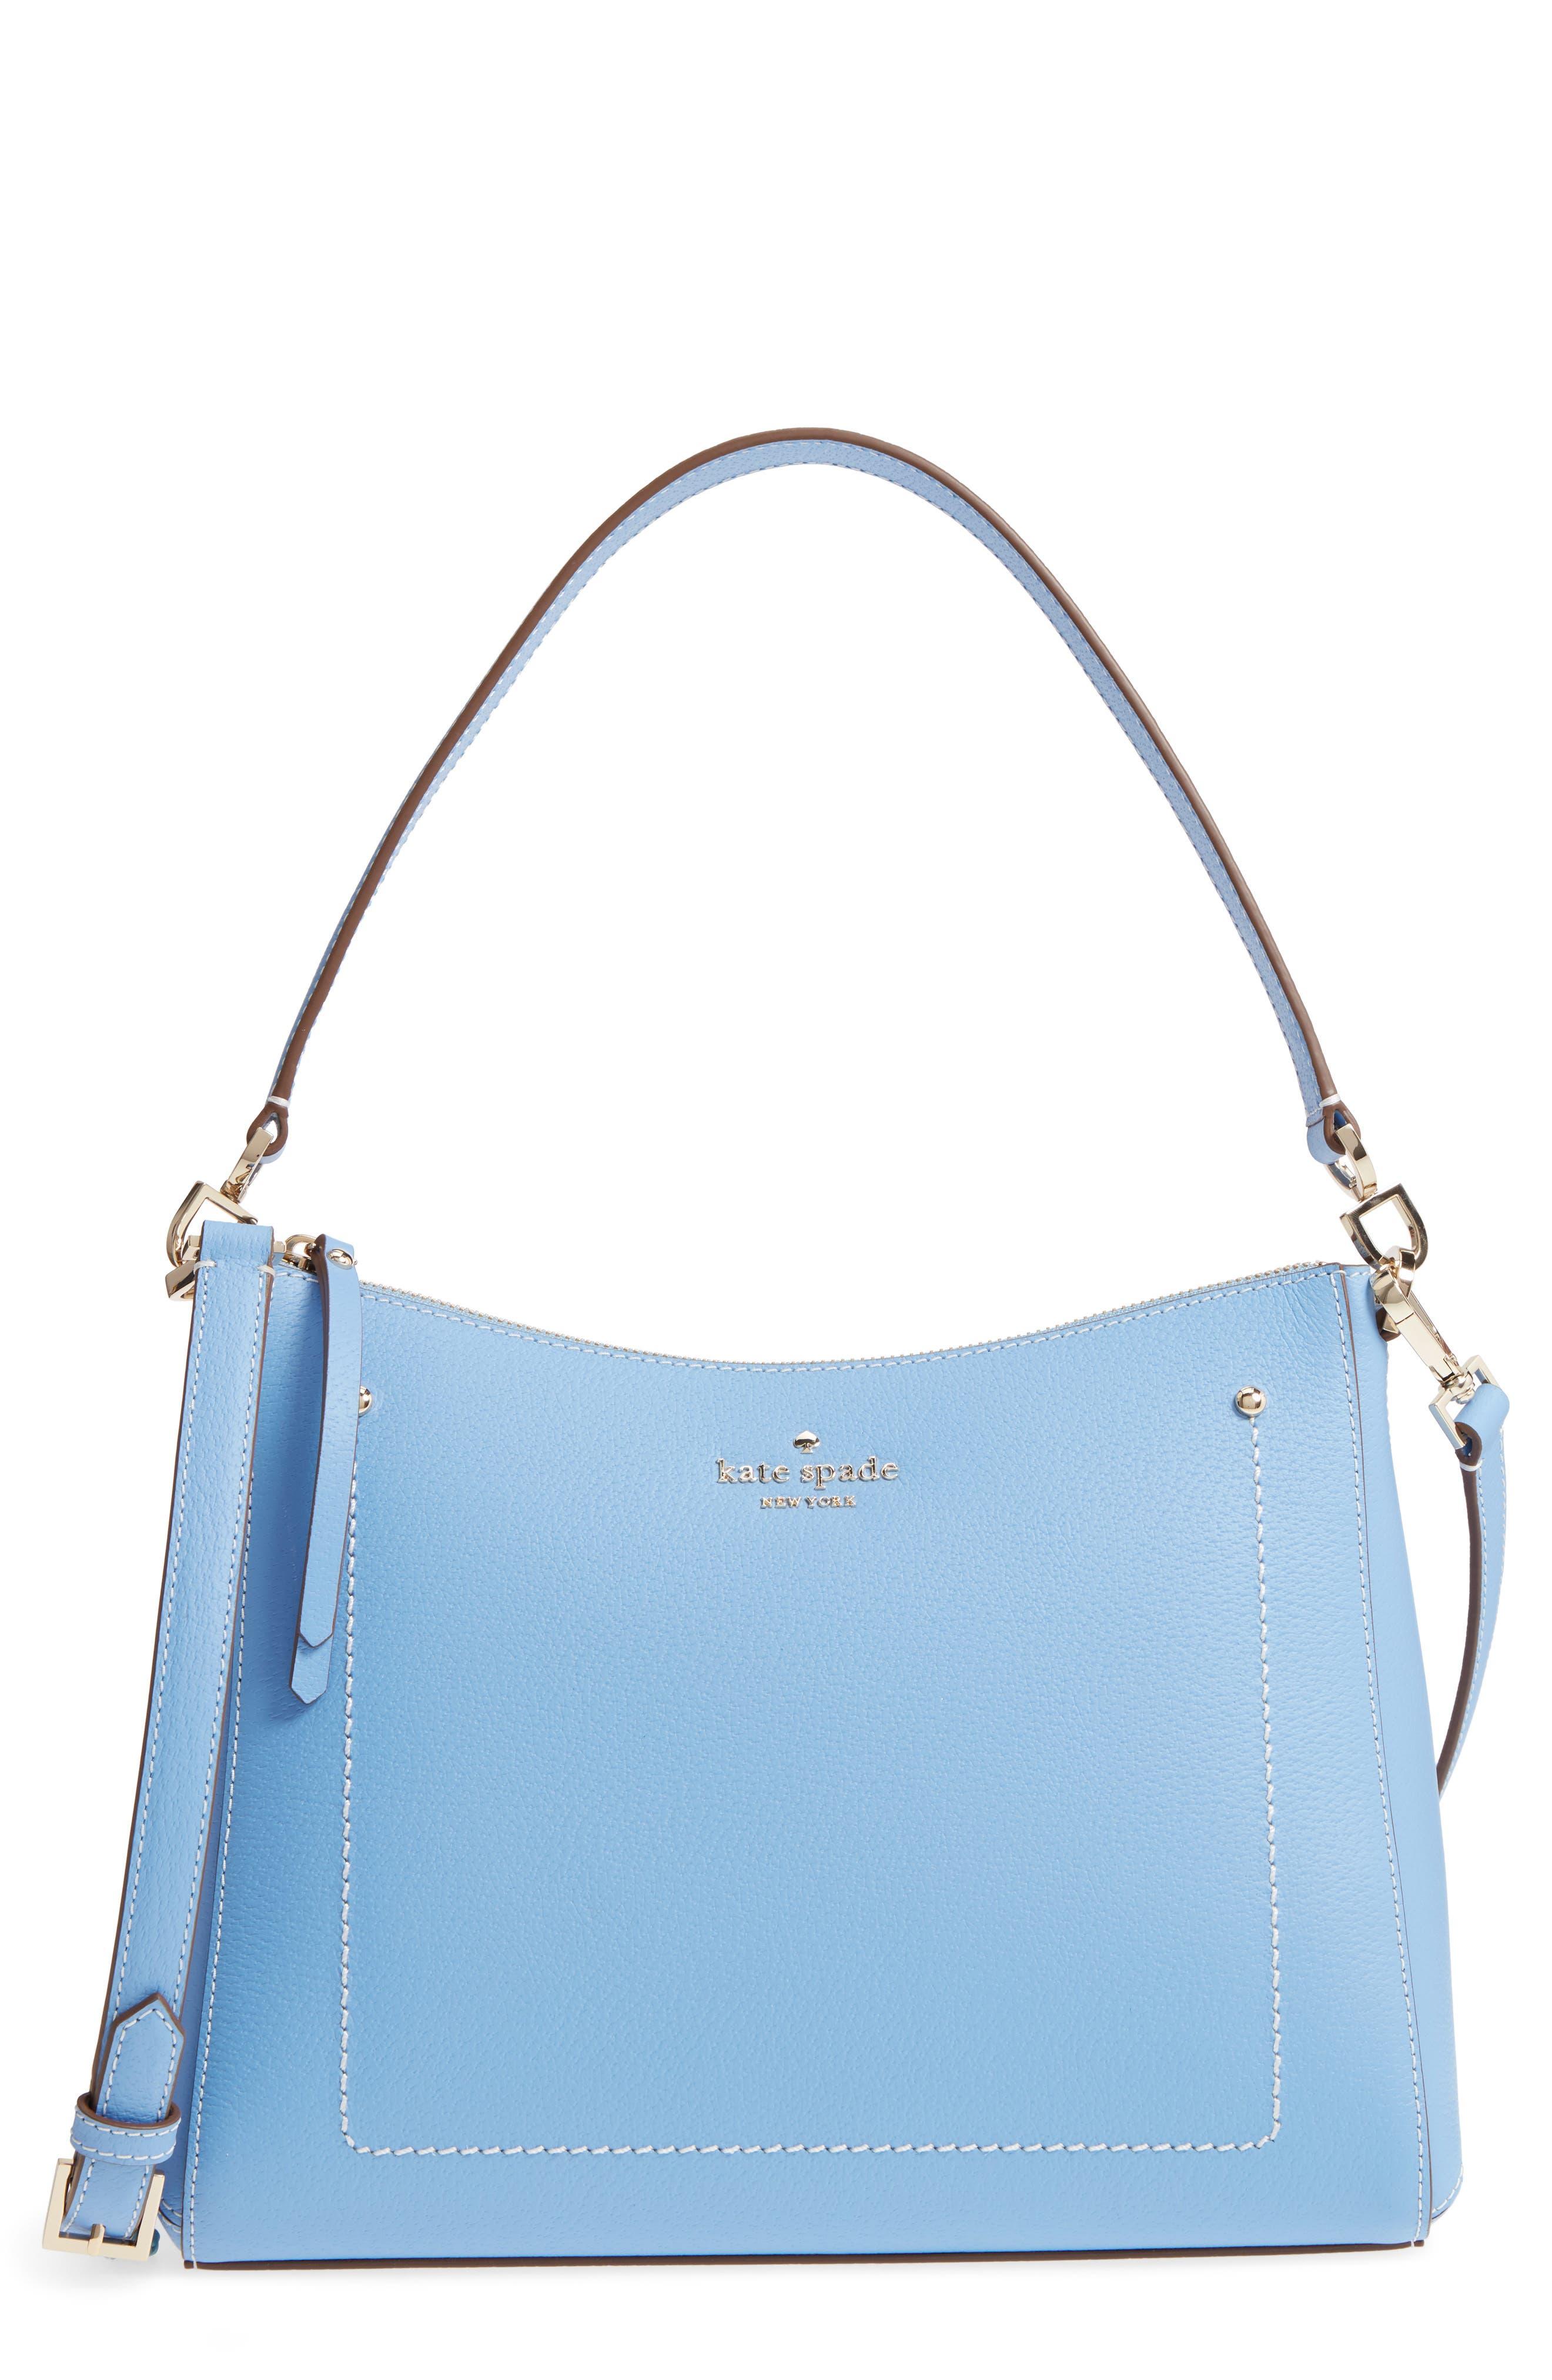 thompson street - marti leather shoulder/crossbody bag,                             Main thumbnail 1, color,                             Fable Blue